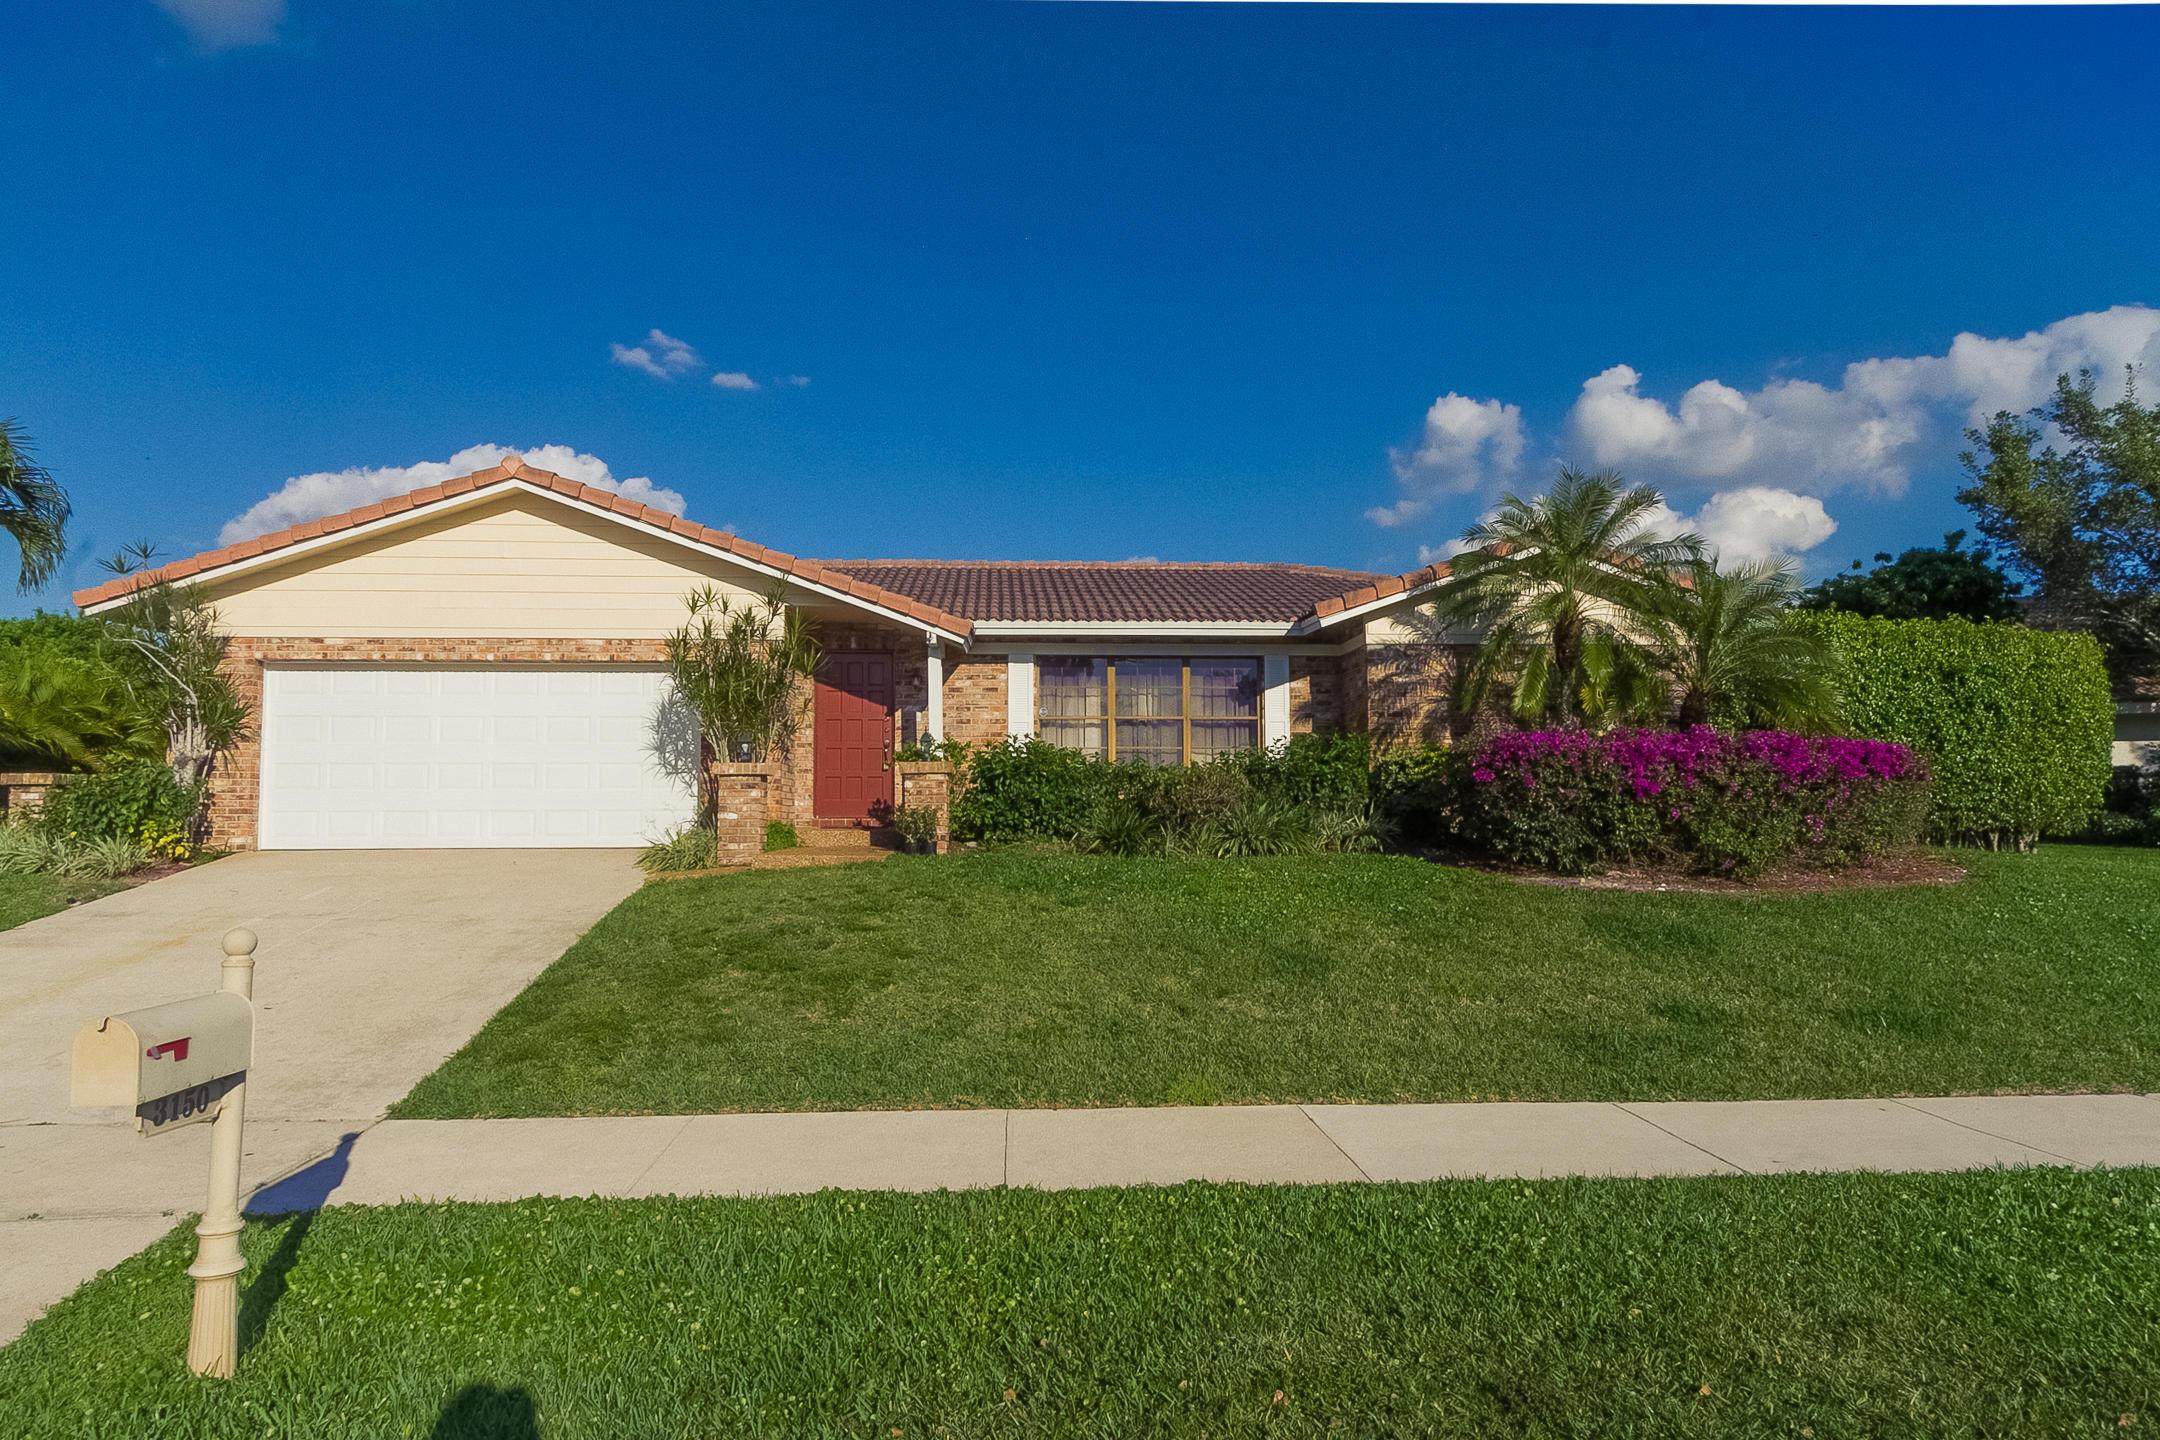 Photo of 3150 NW 23rd Court, Boca Raton, FL 33431